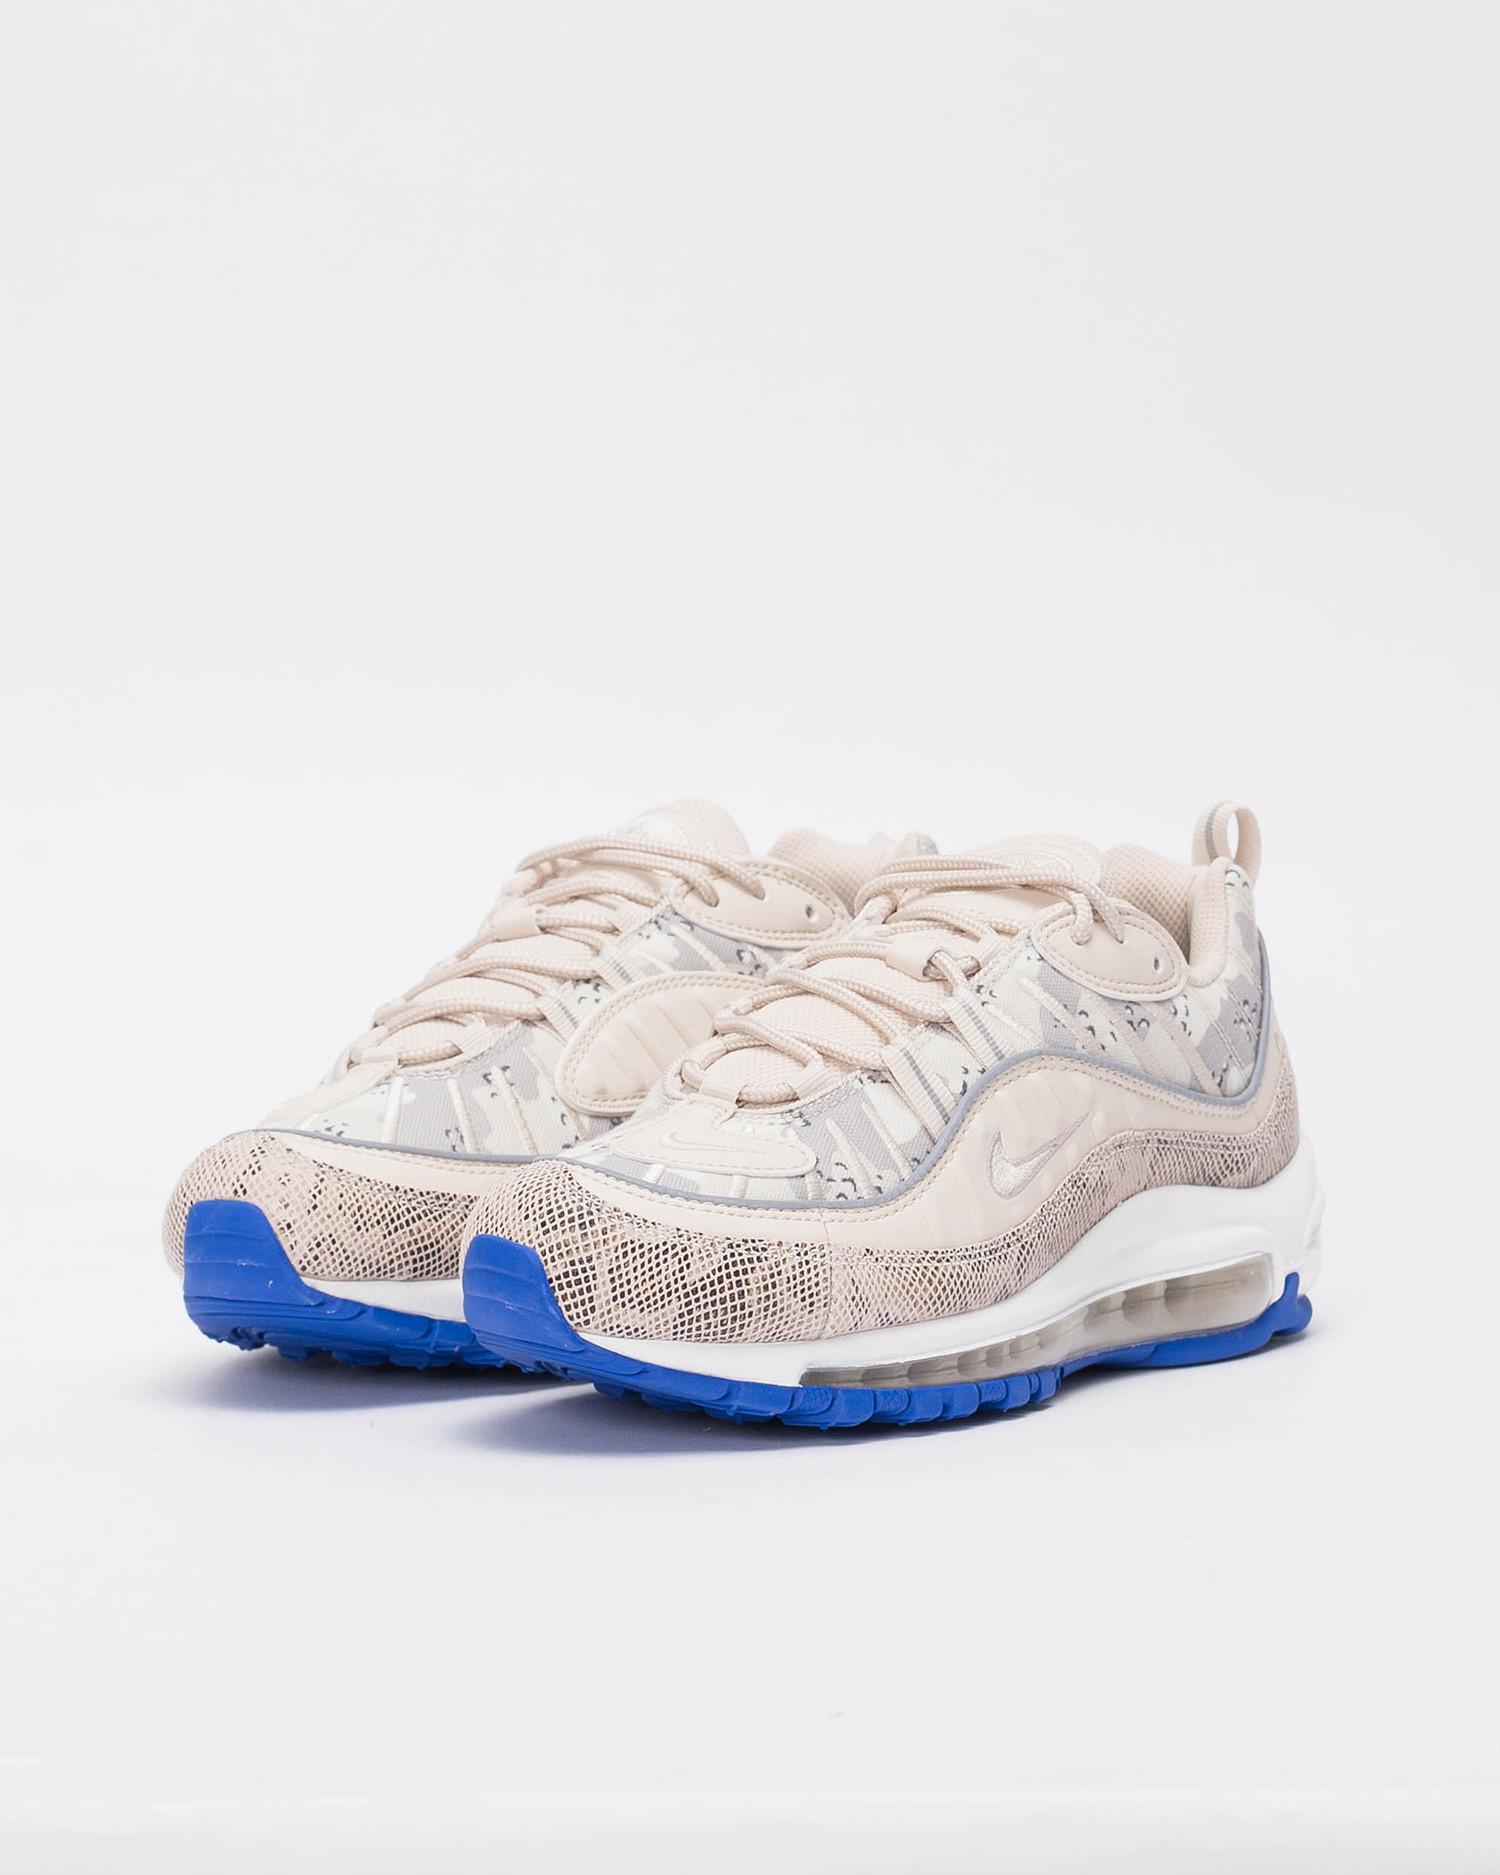 Nike W Air Max 98 Premium Lt orewood brn/Lt orewood Brn